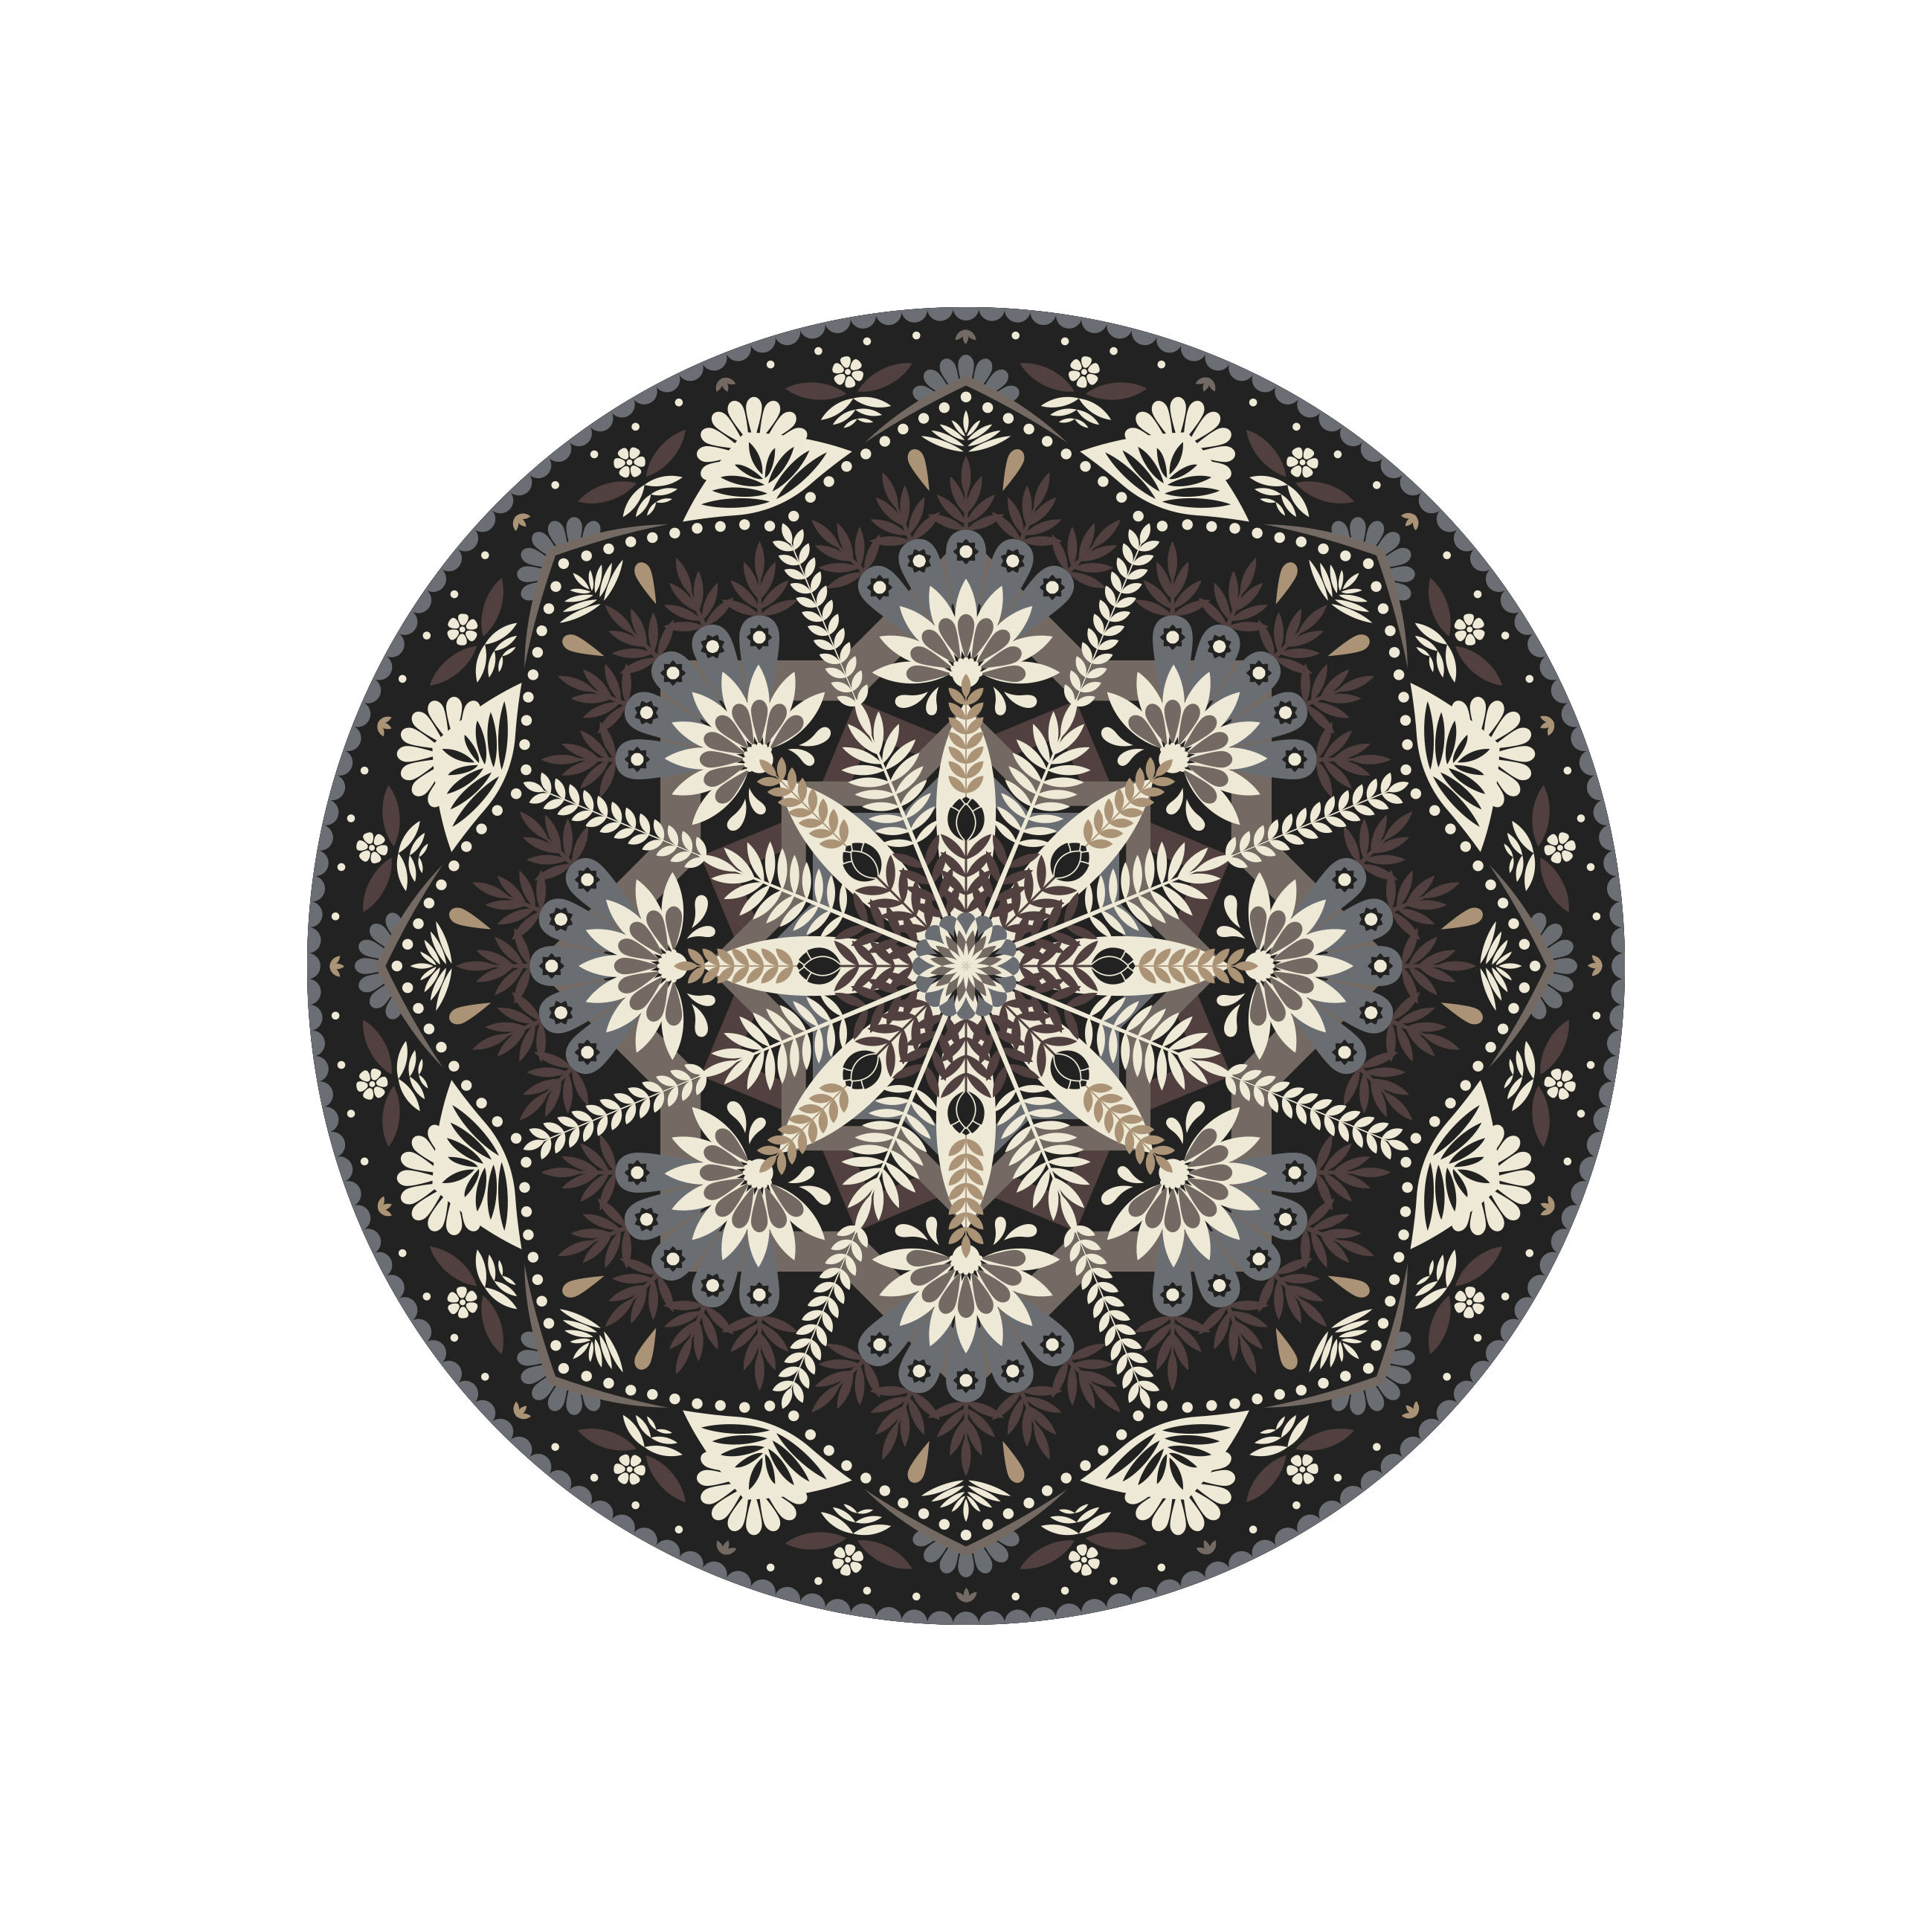 Tableware - Napkins & Tablecloths - Baba Souk Placemat - / Ø 38 cm - Vinyl by PÔDEVACHE - Grey, brown, blue - Vinal